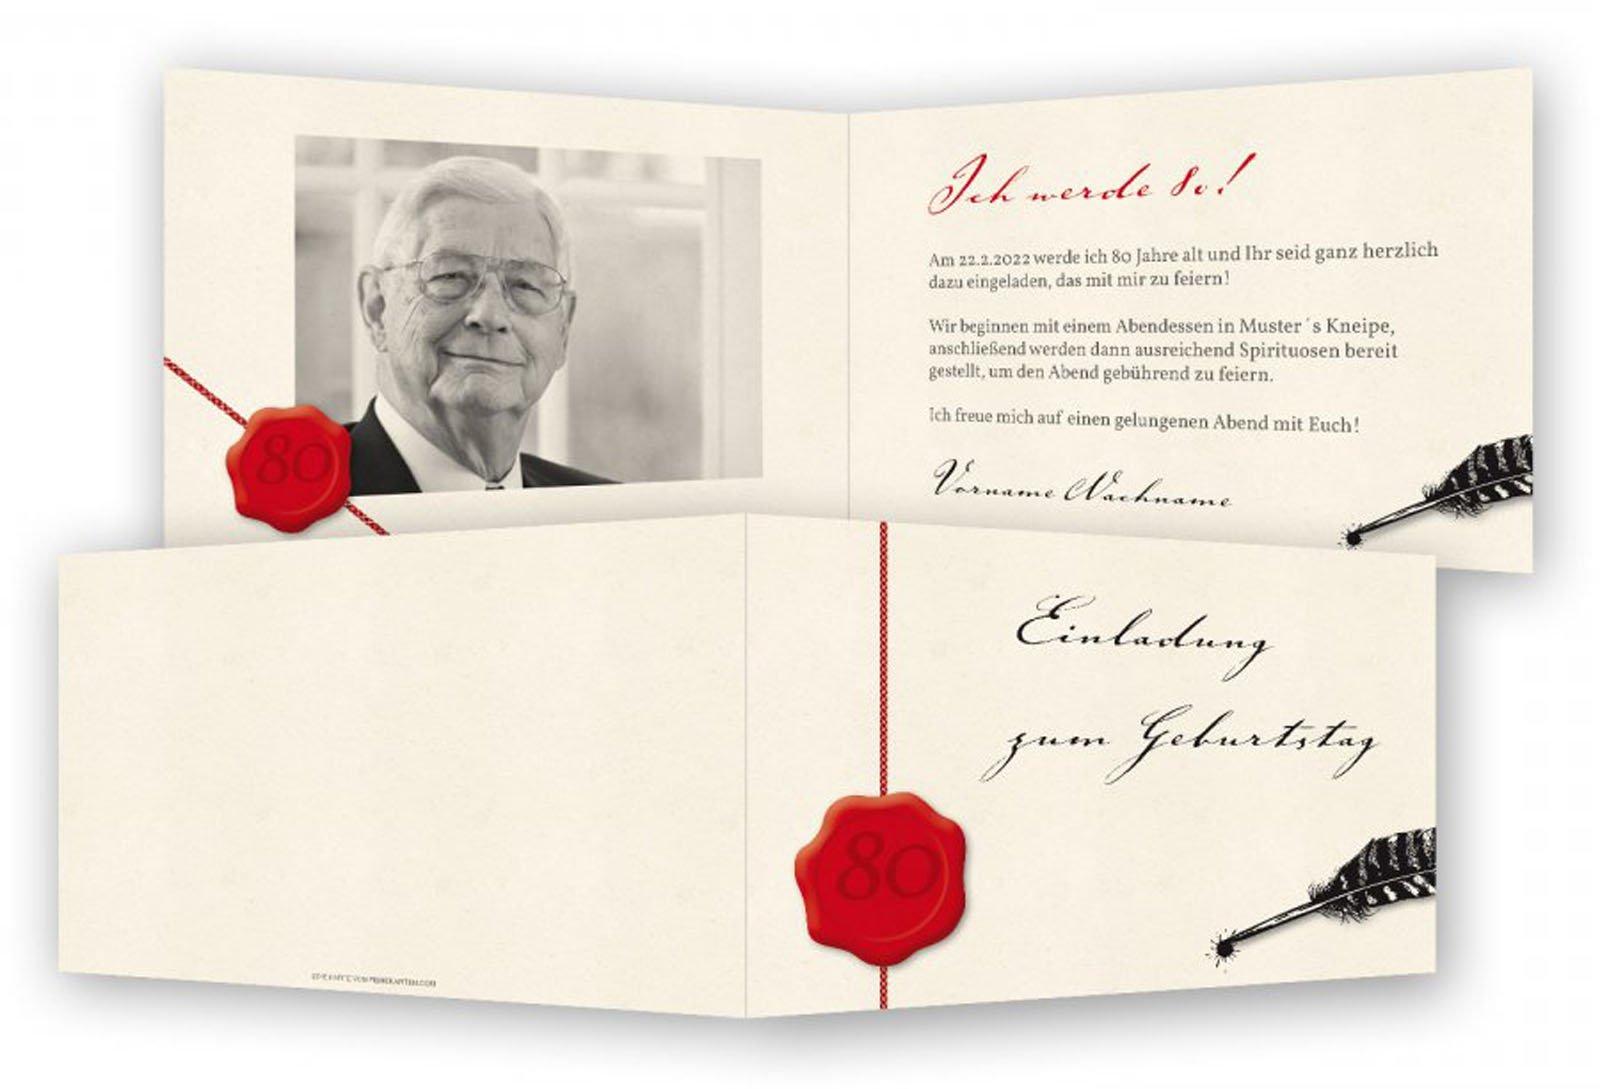 Einladung 80 Geburtstag Einladung 80 Geburtstag Spruch